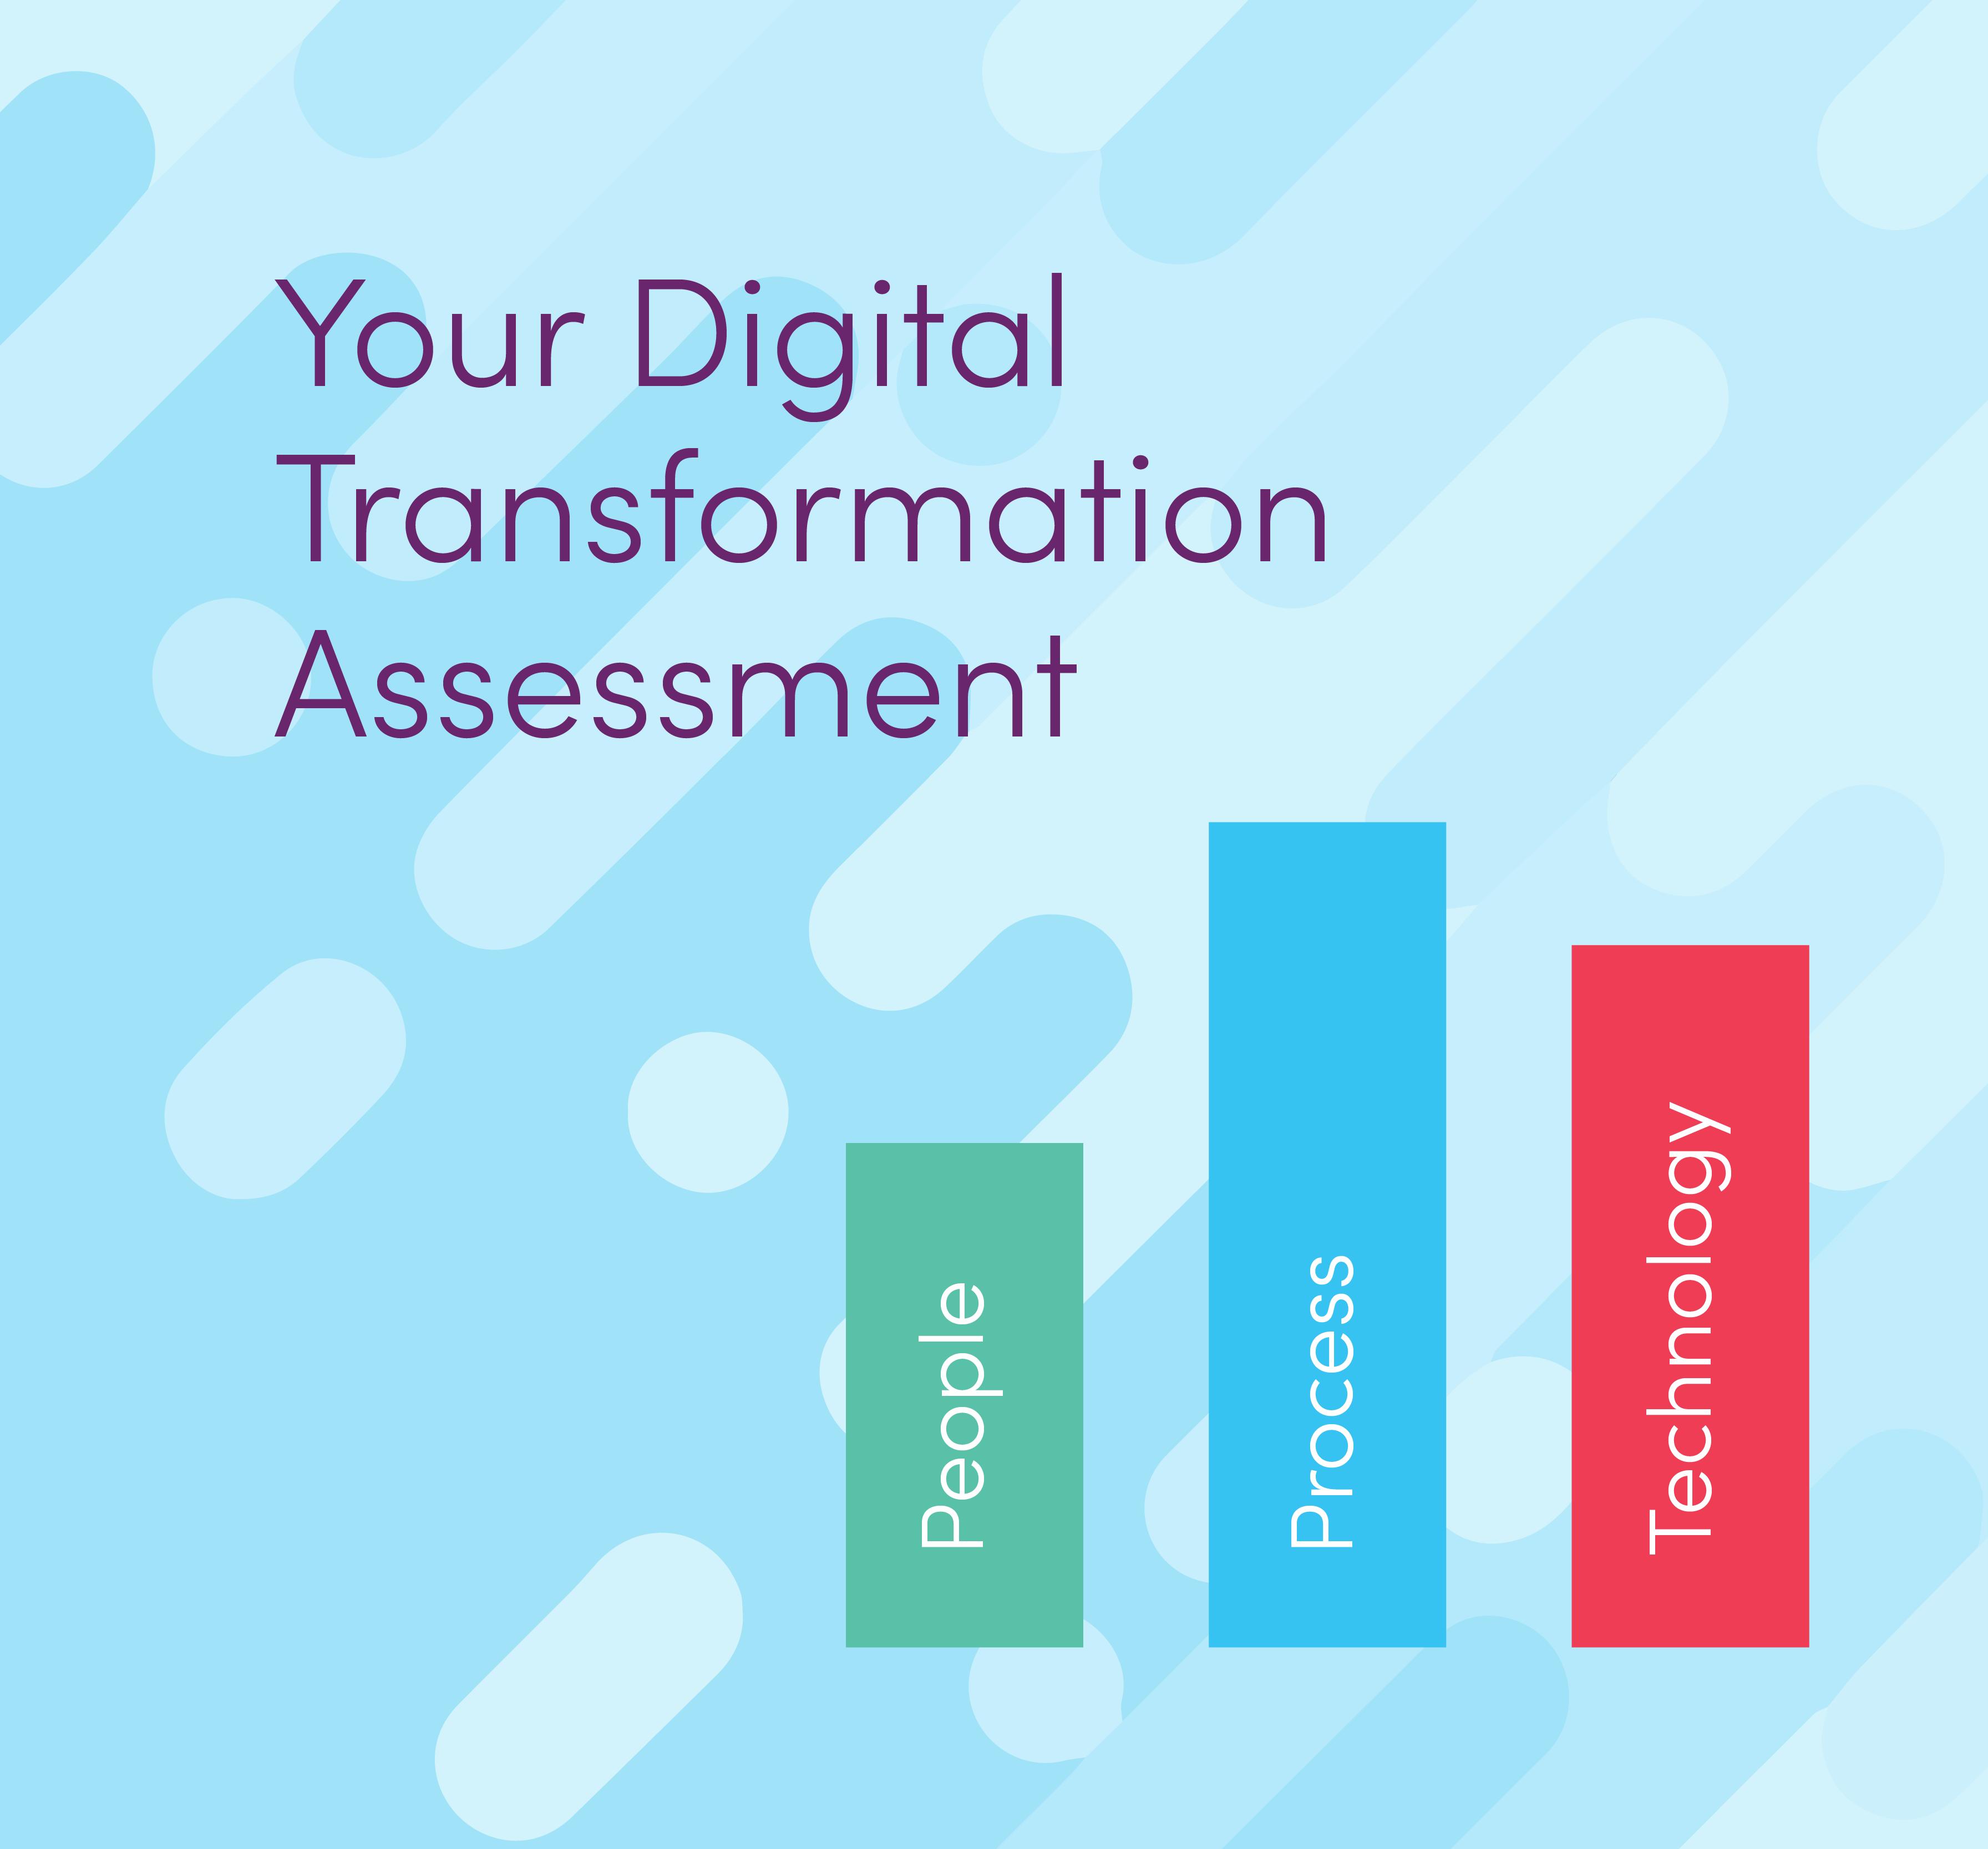 Digital Transformation Assessment